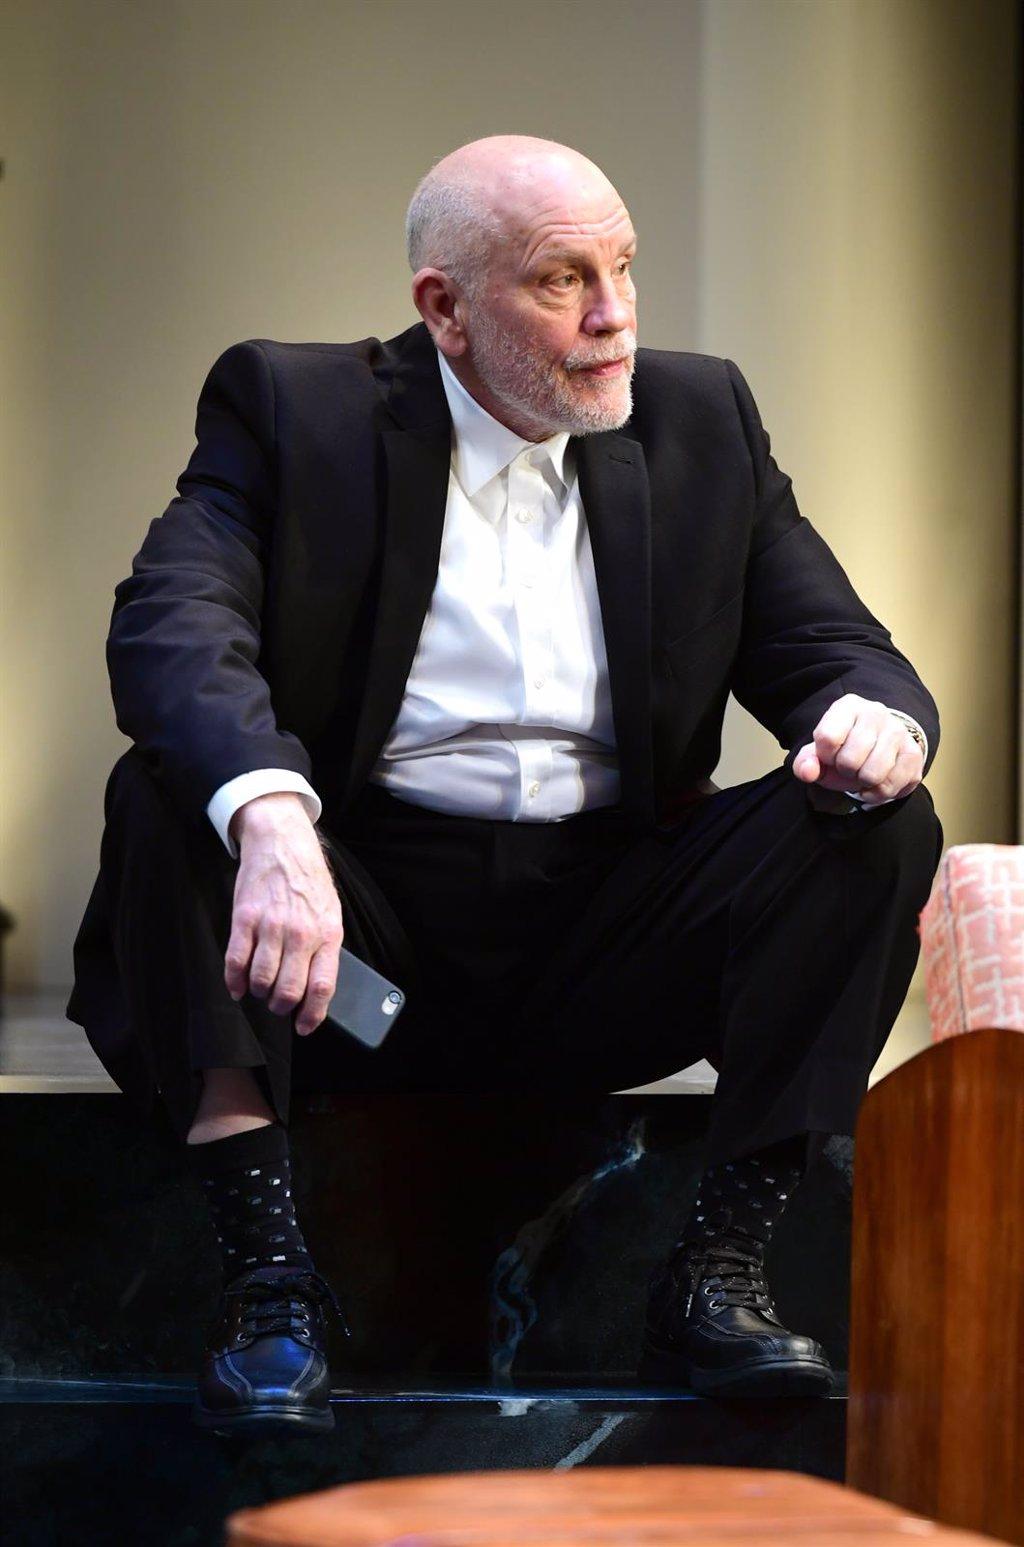 John Malkovich, Angélica Liddell or Max Richter, stars of the new season of Teatros del Canal